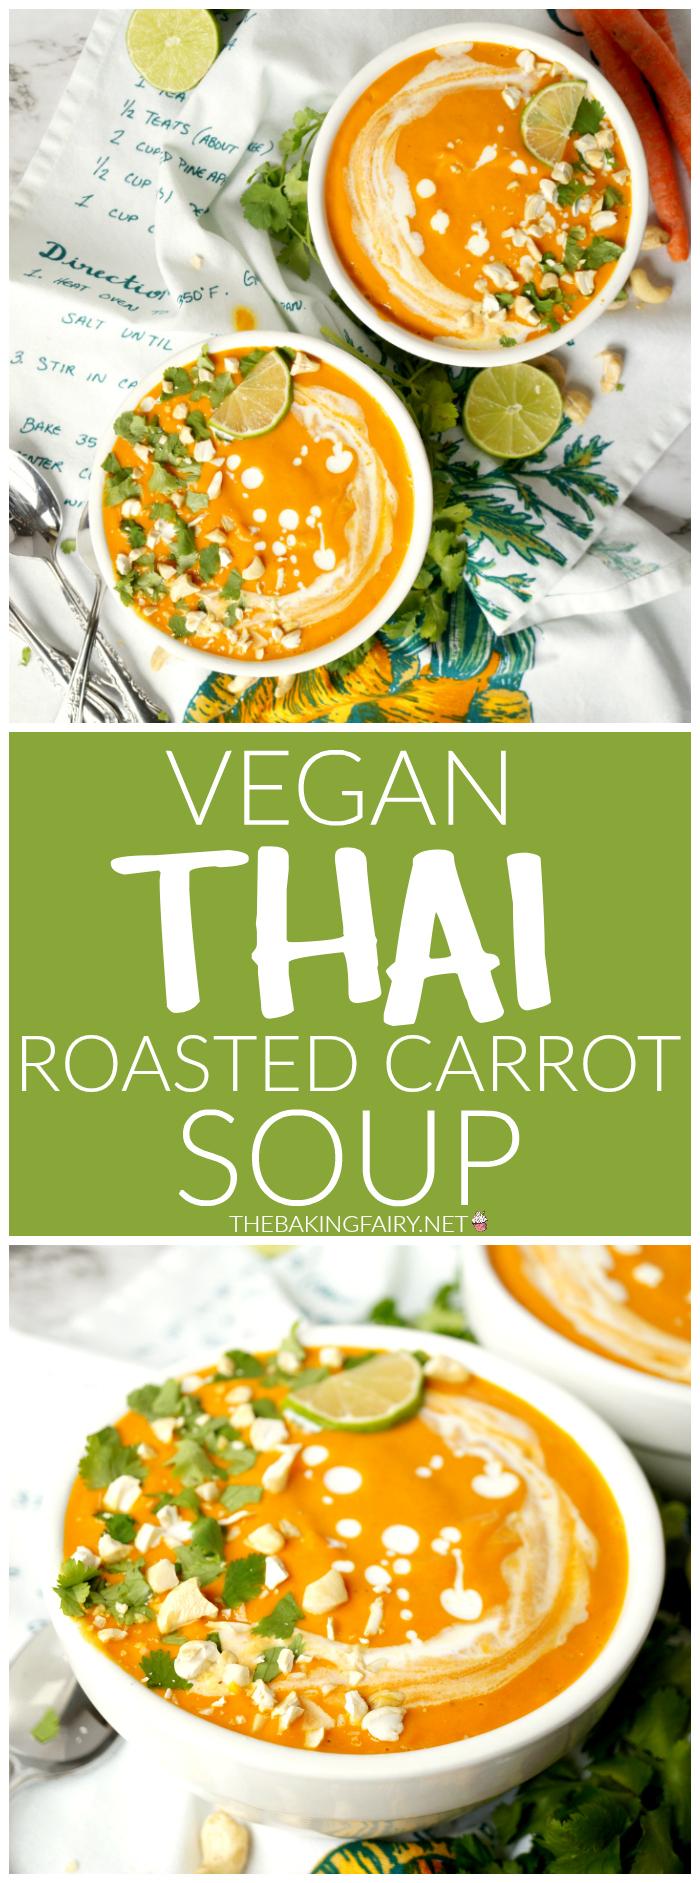 vegan Thai roasted carrot soup | The Baking Fairy